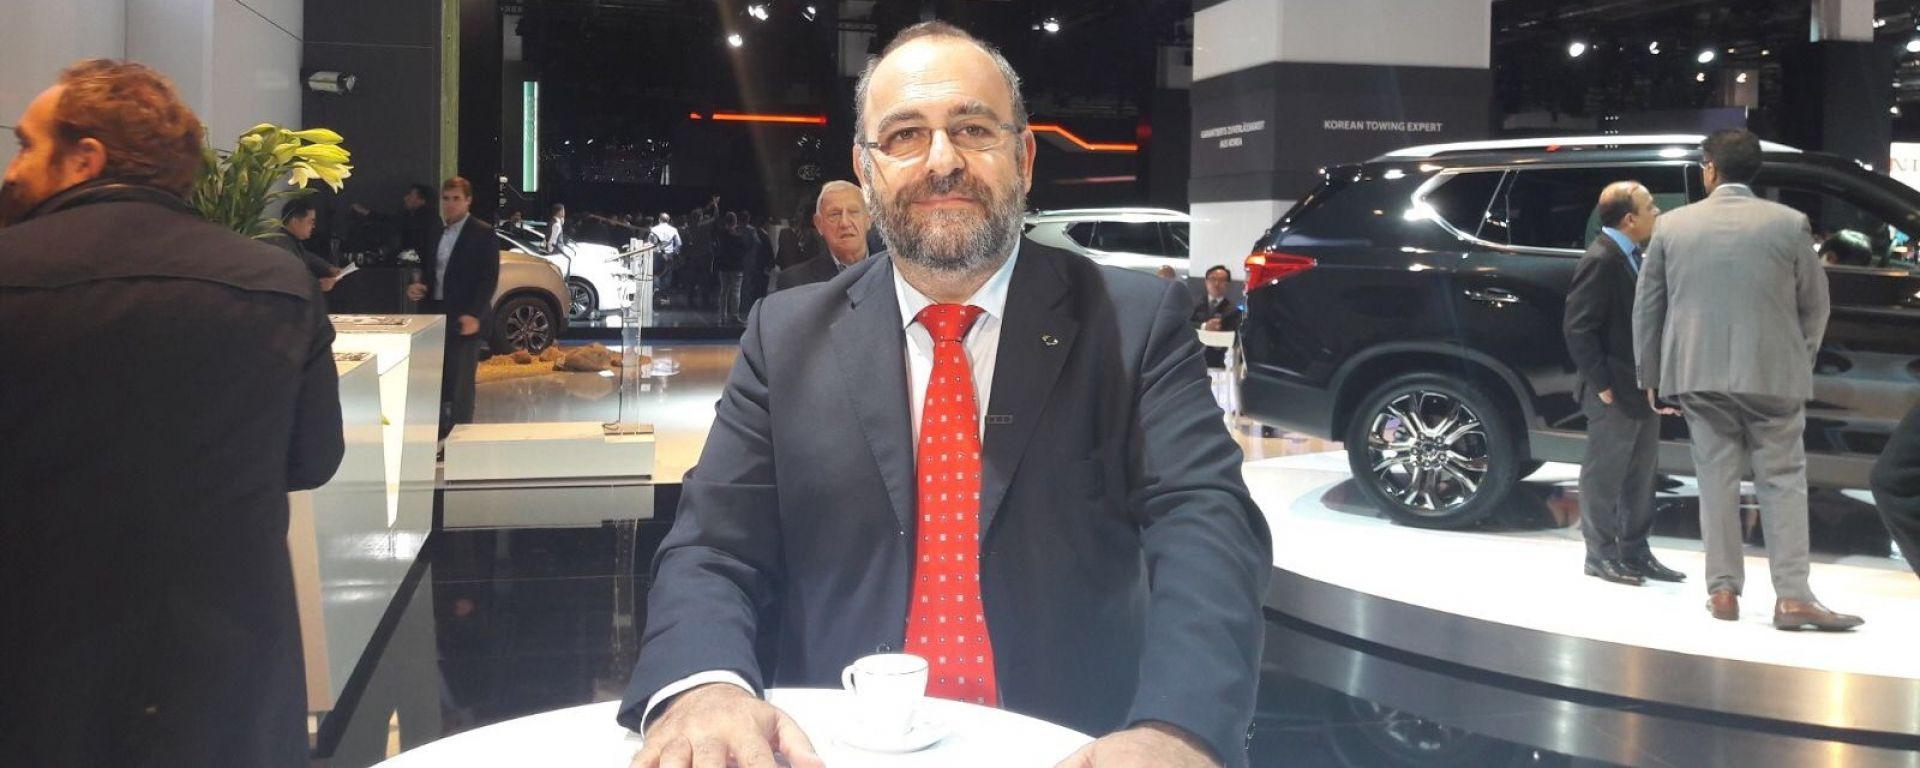 Le novità Ssangyong raccontate da Maurizio Melzi, Brand Manager Ssangyong Italia